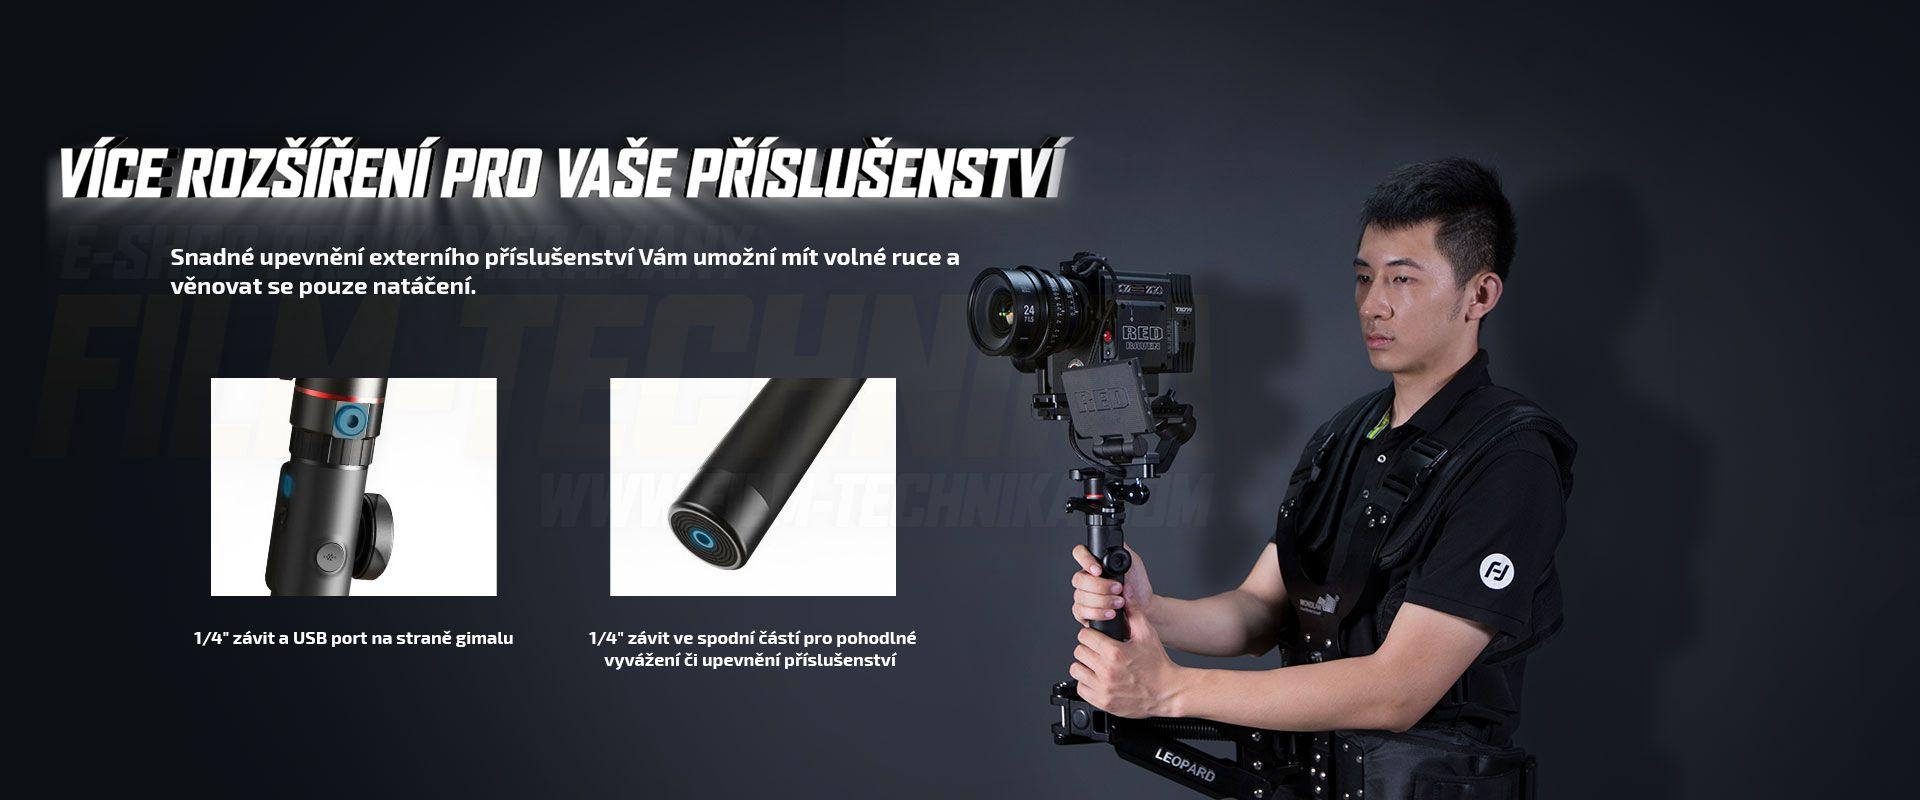 film-technika-feiyu-ak2000-10intext